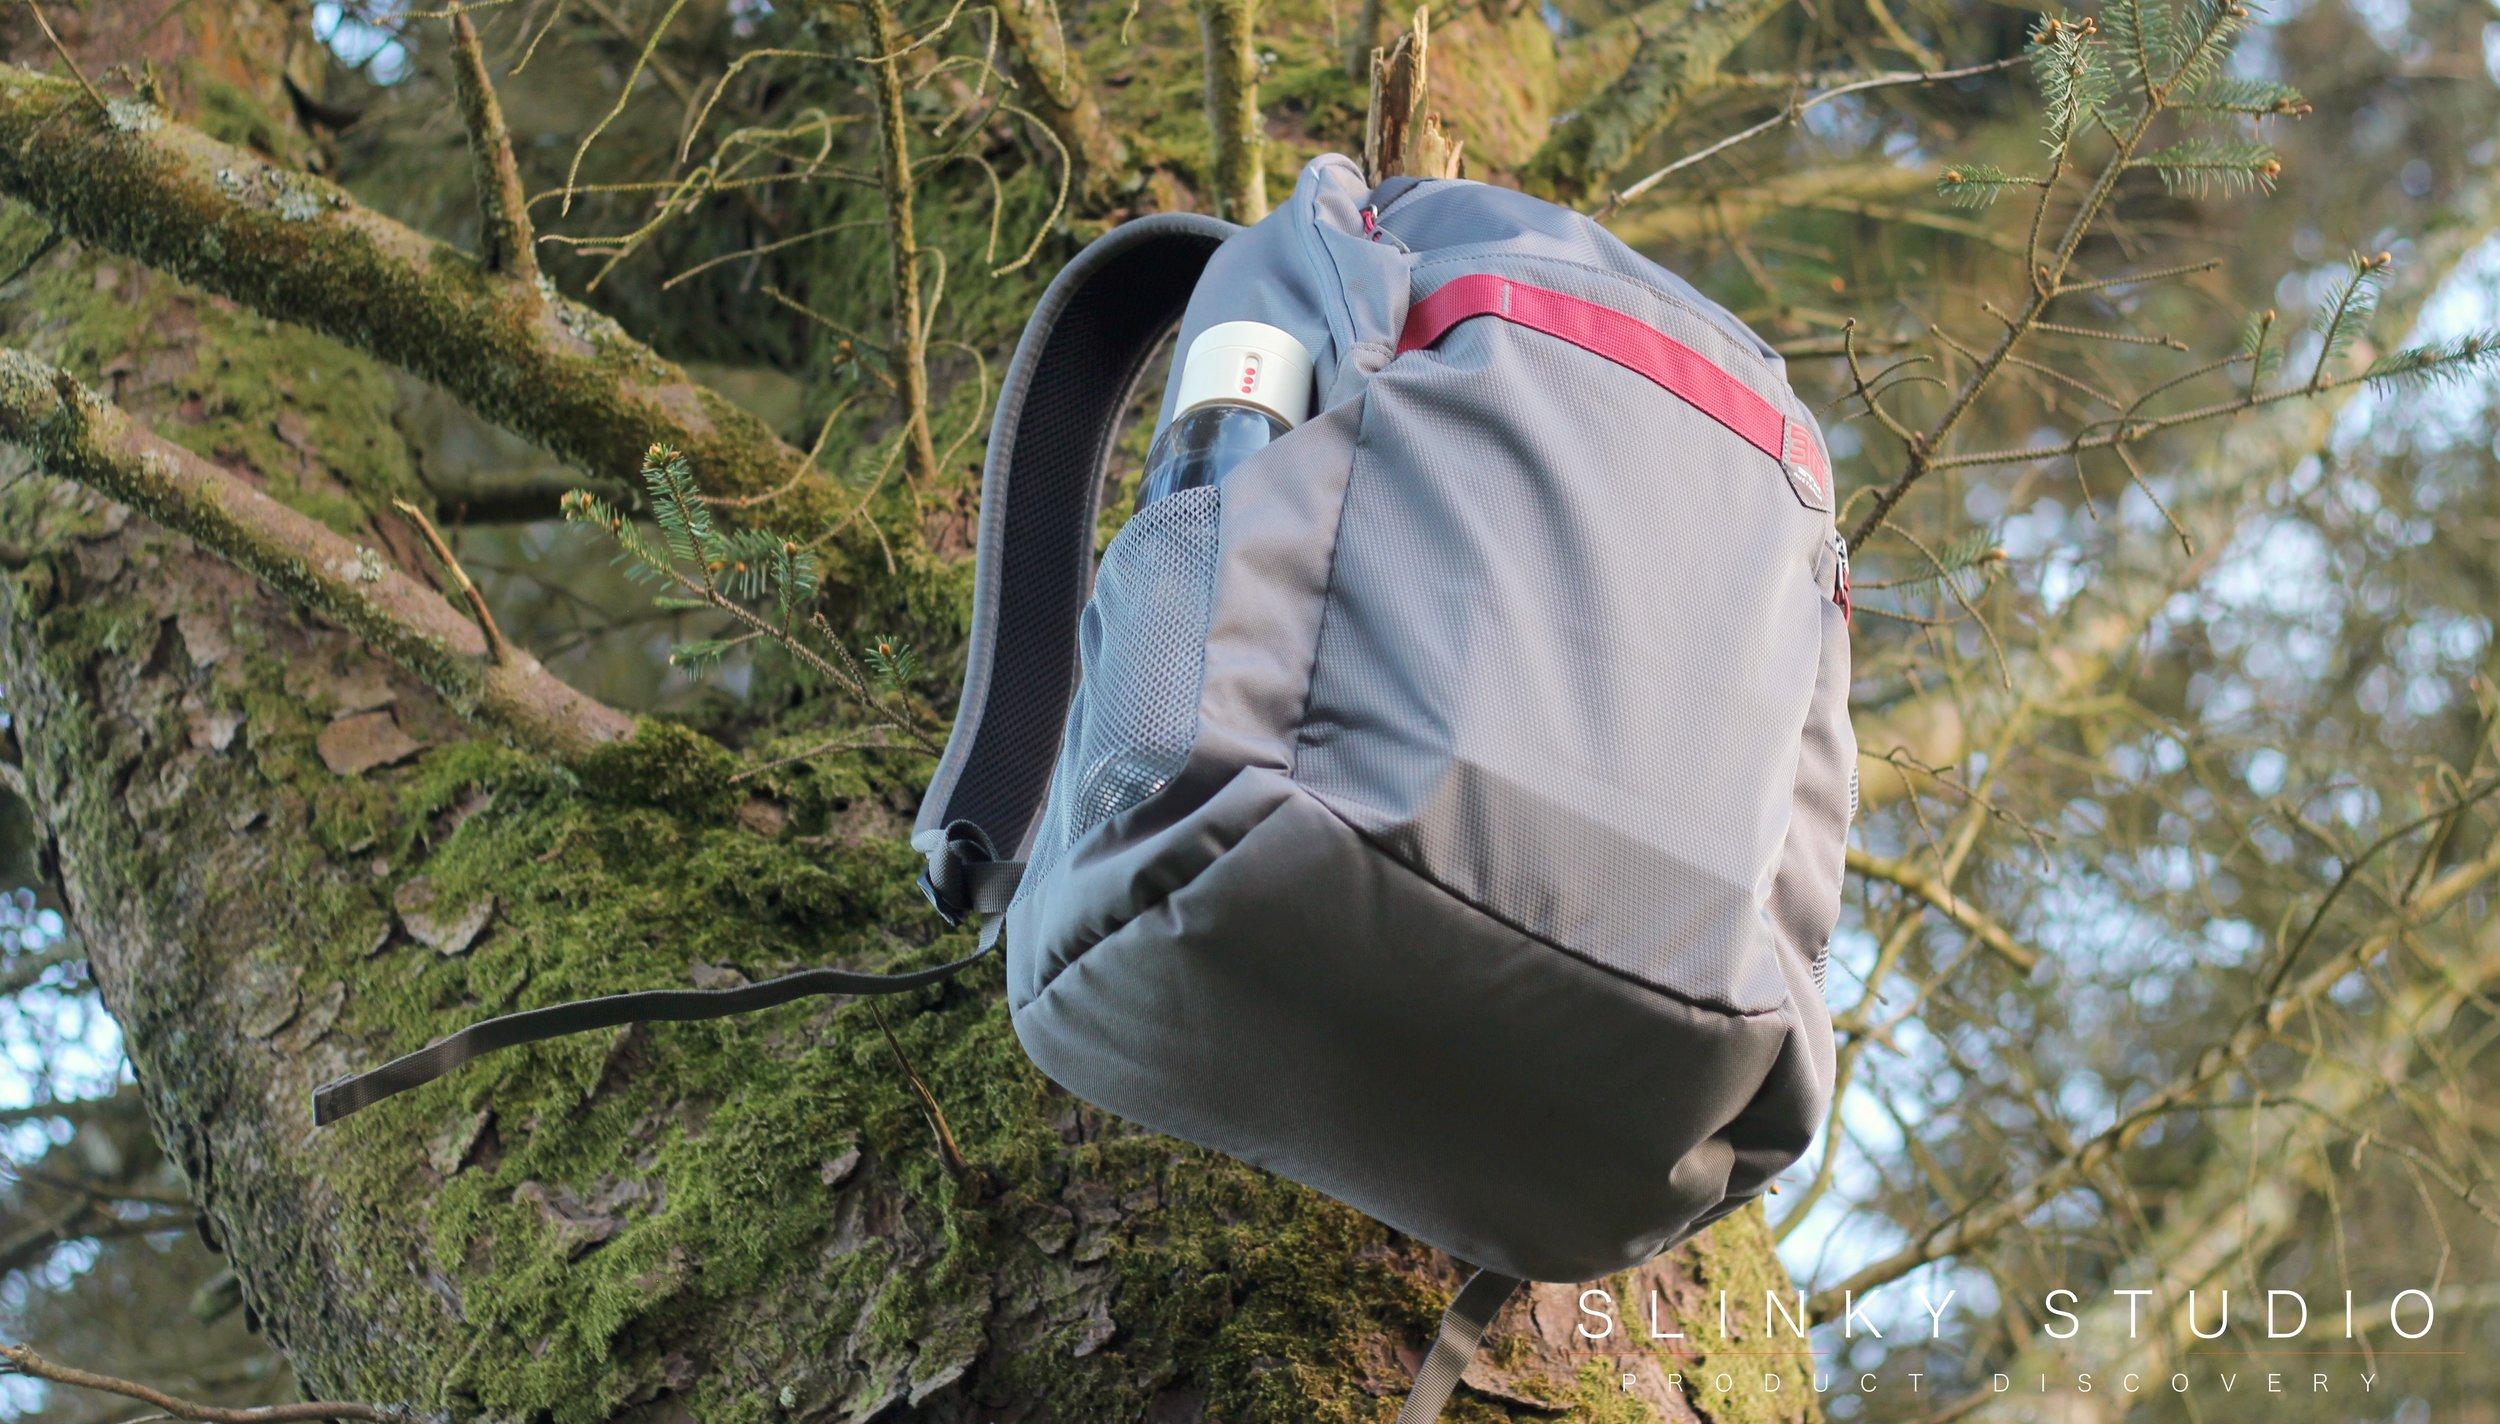 STM Saga Backpack Front & Below View From Tree.jpg